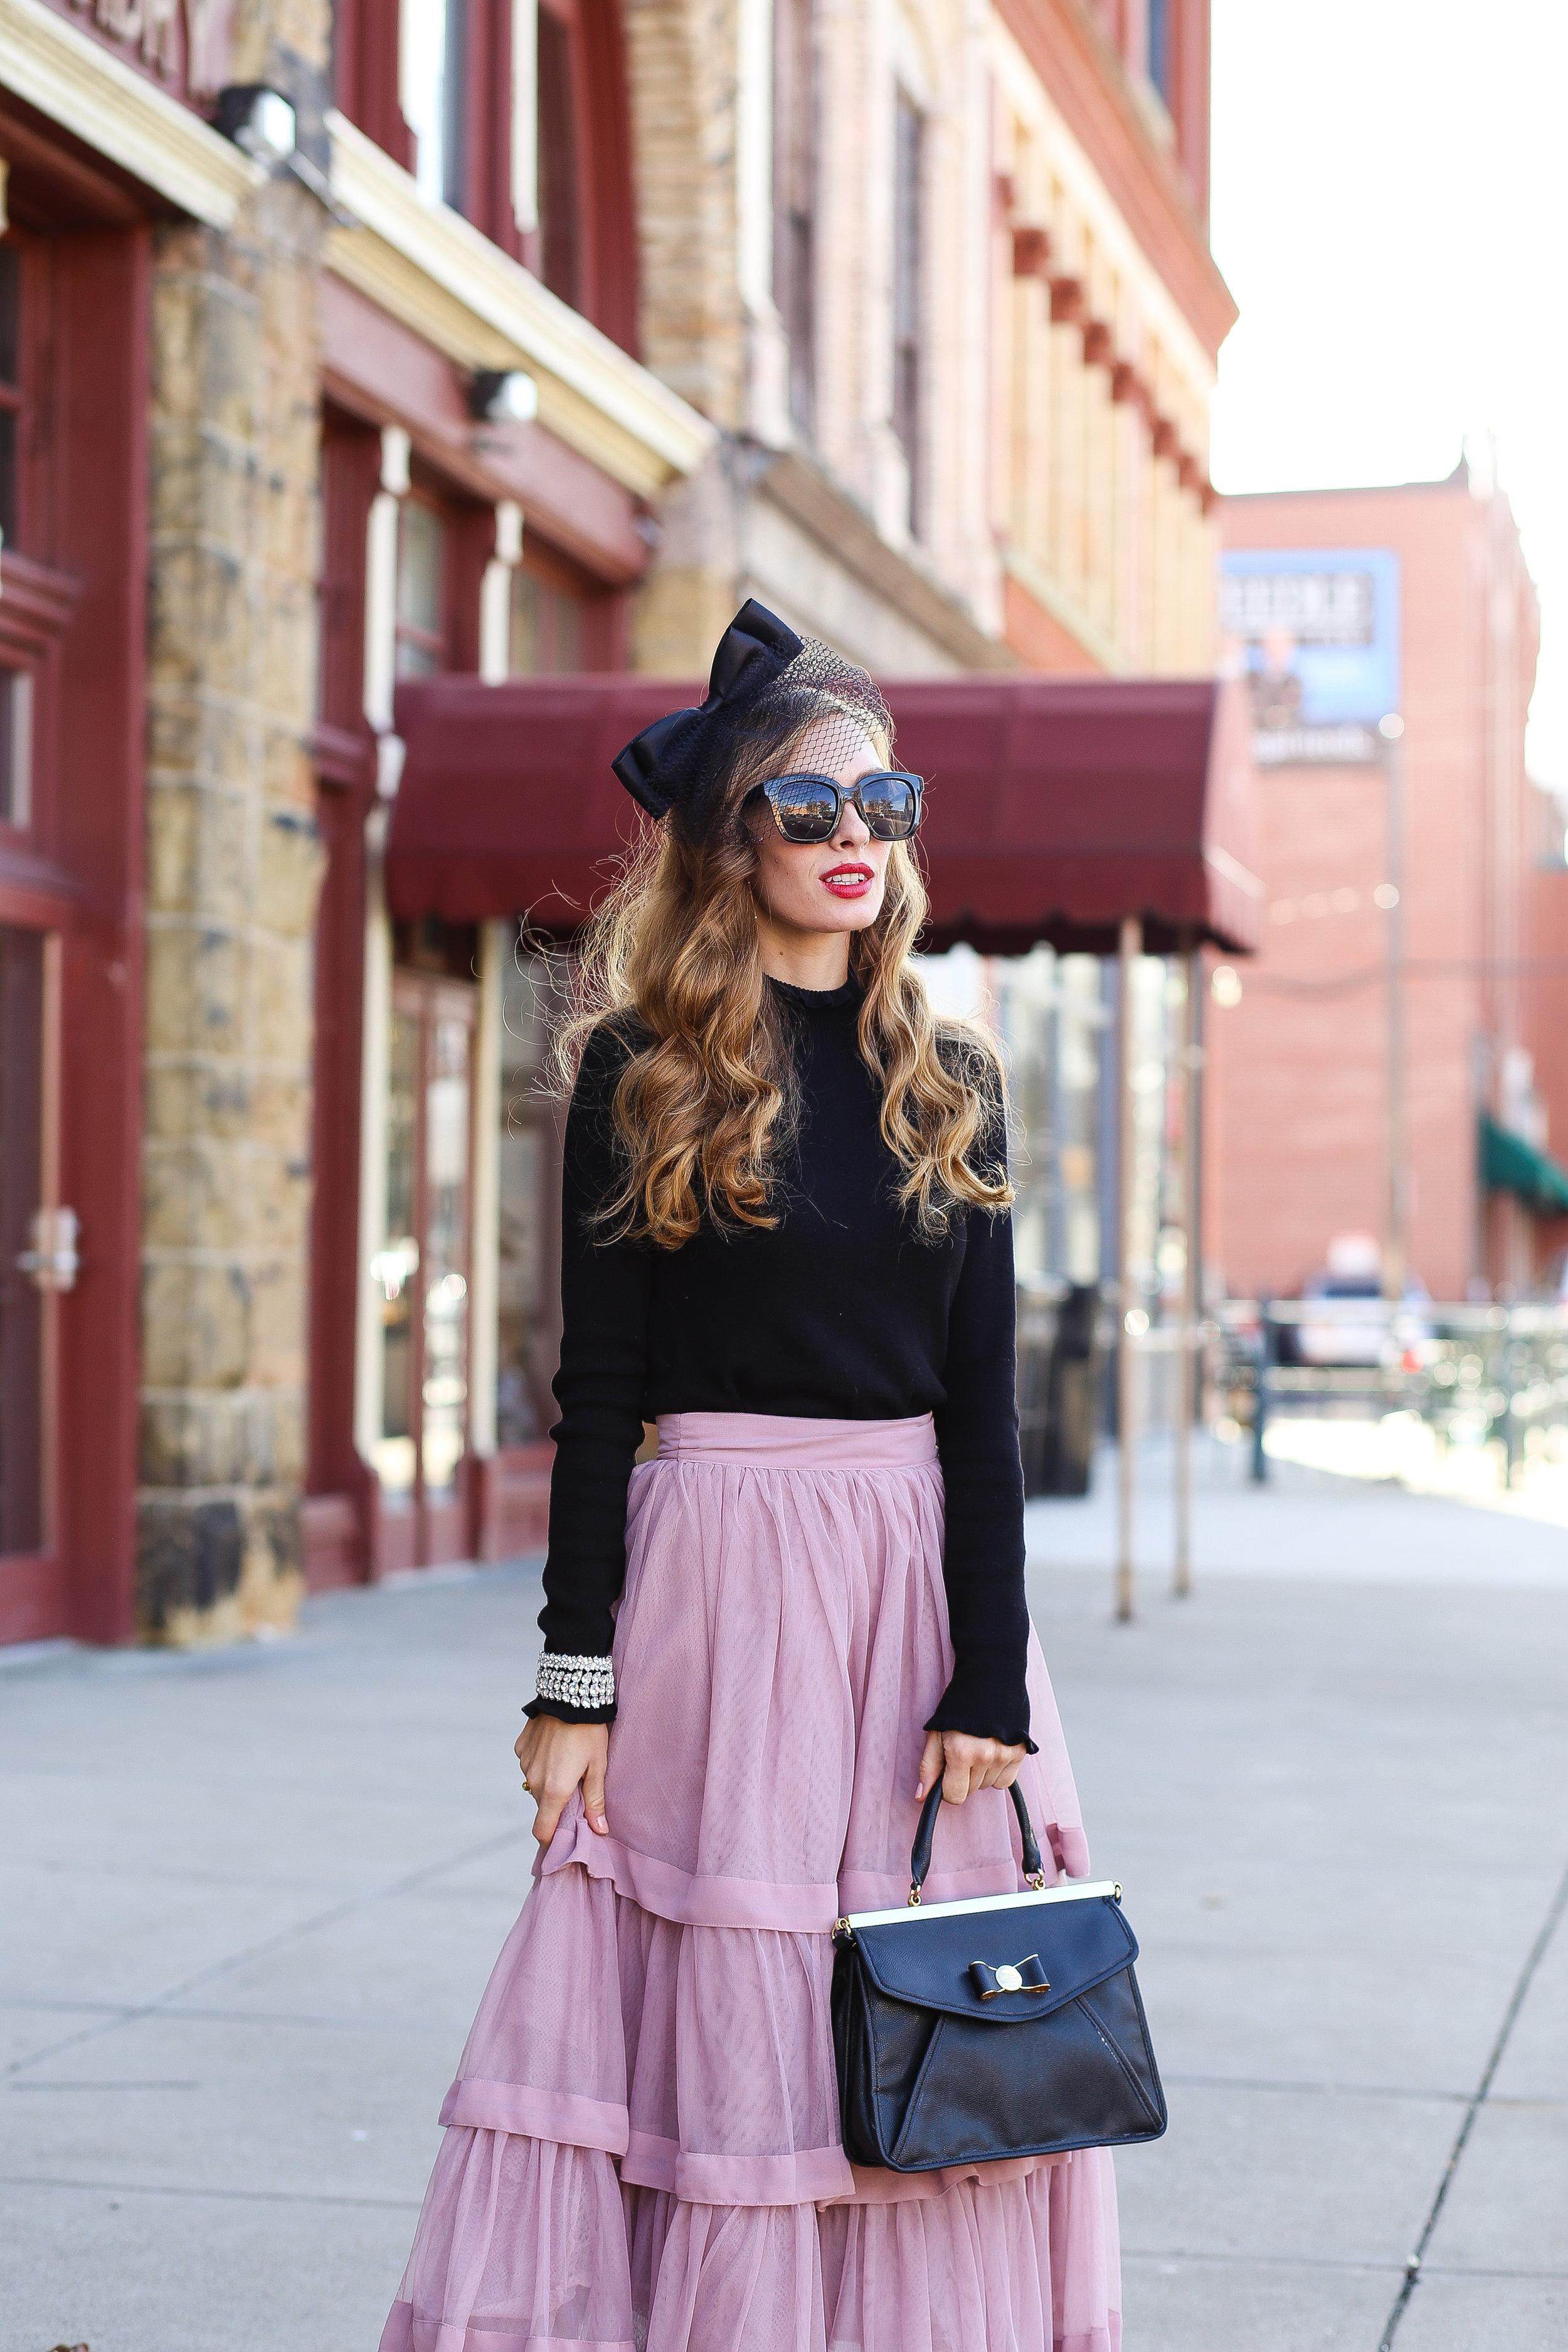 Pink Frills- Enchanting Elegance